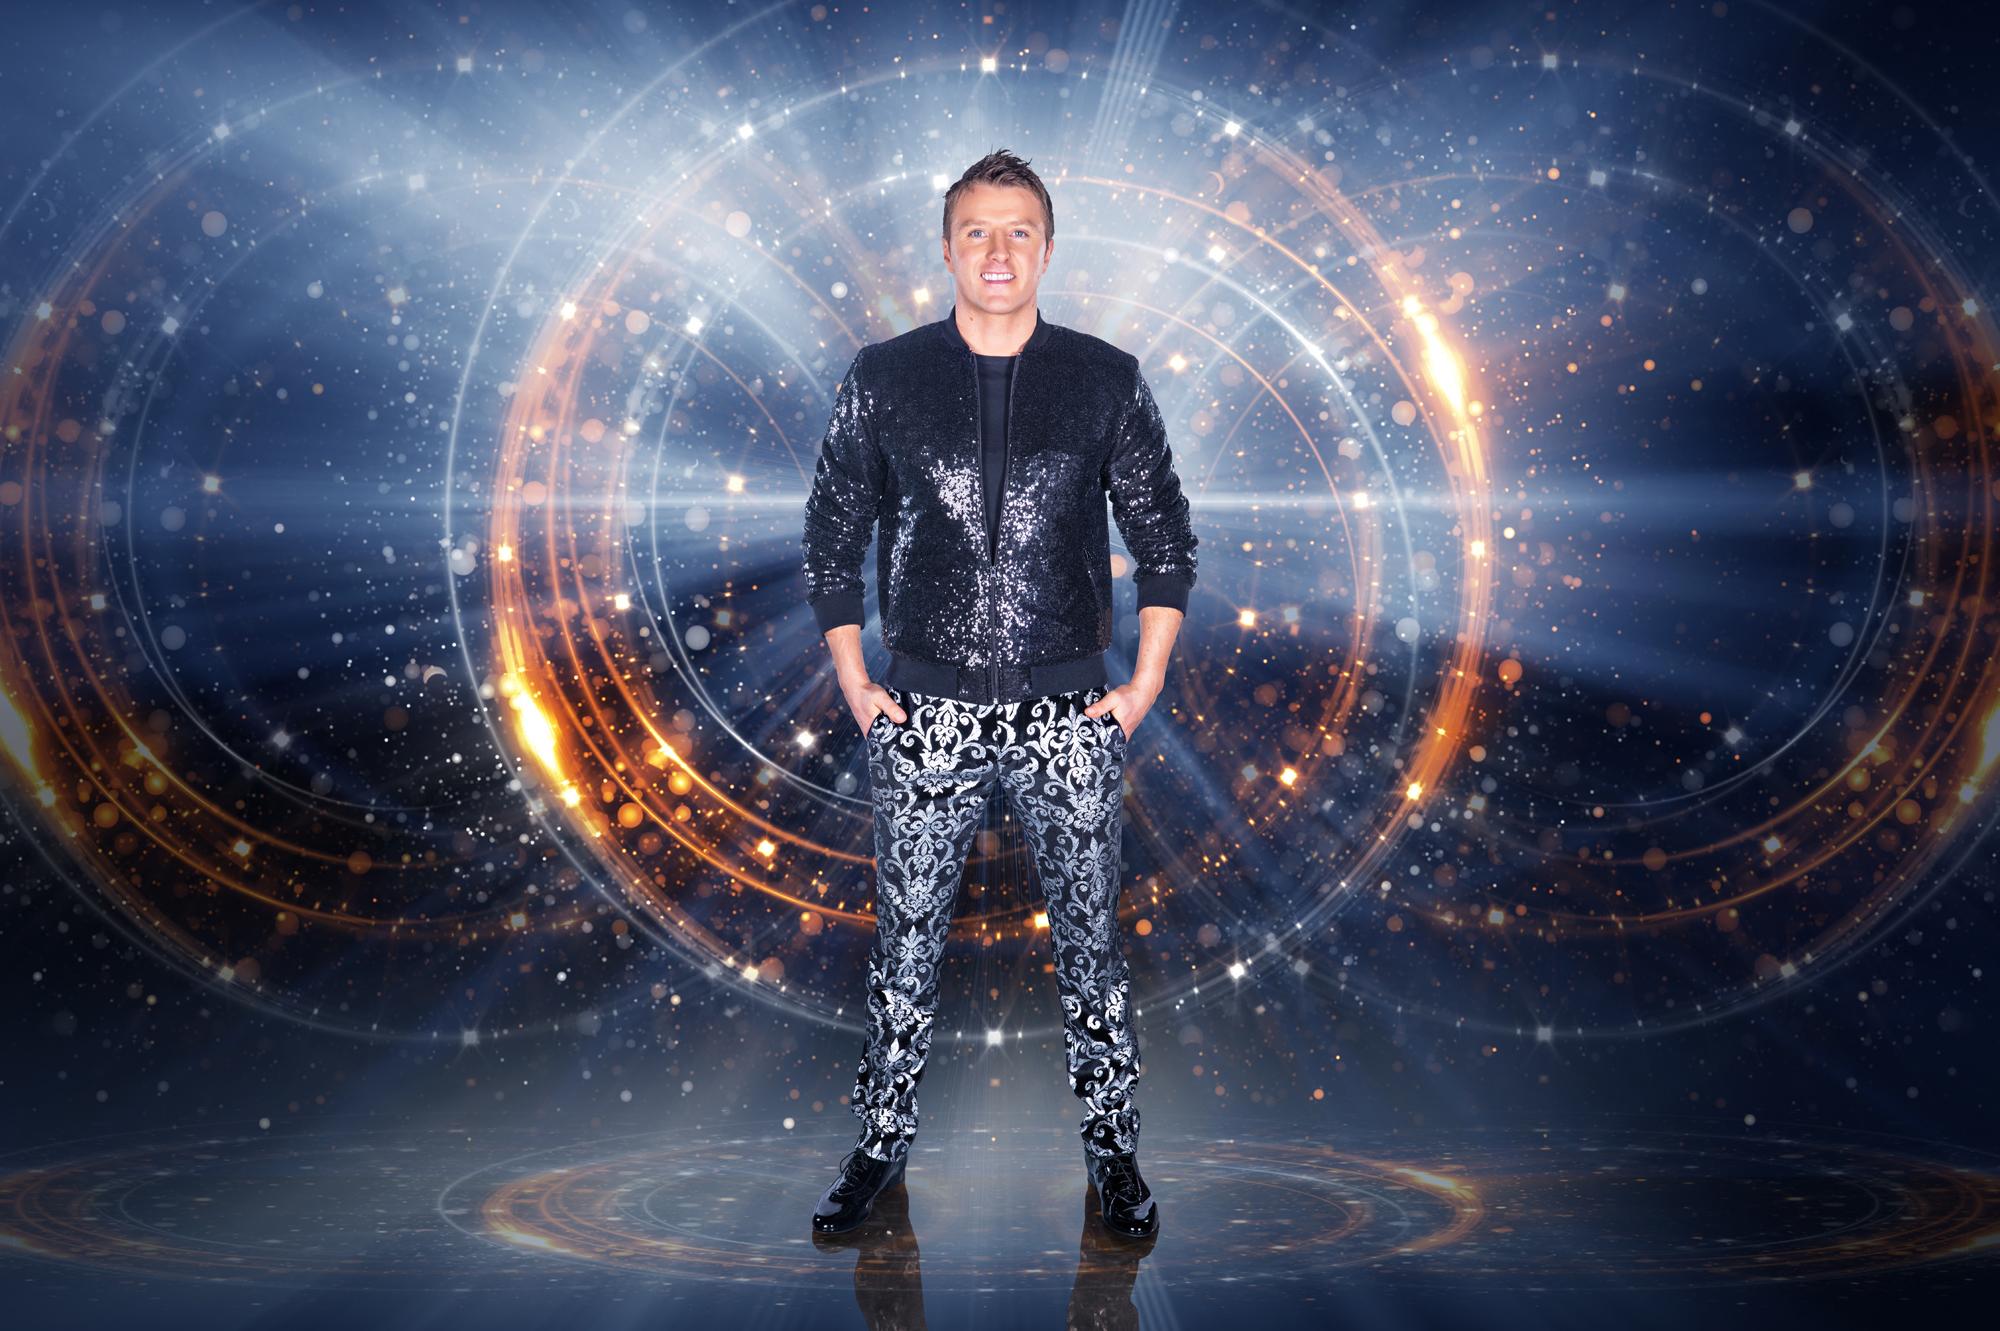 Aidan Dancing with the Stars